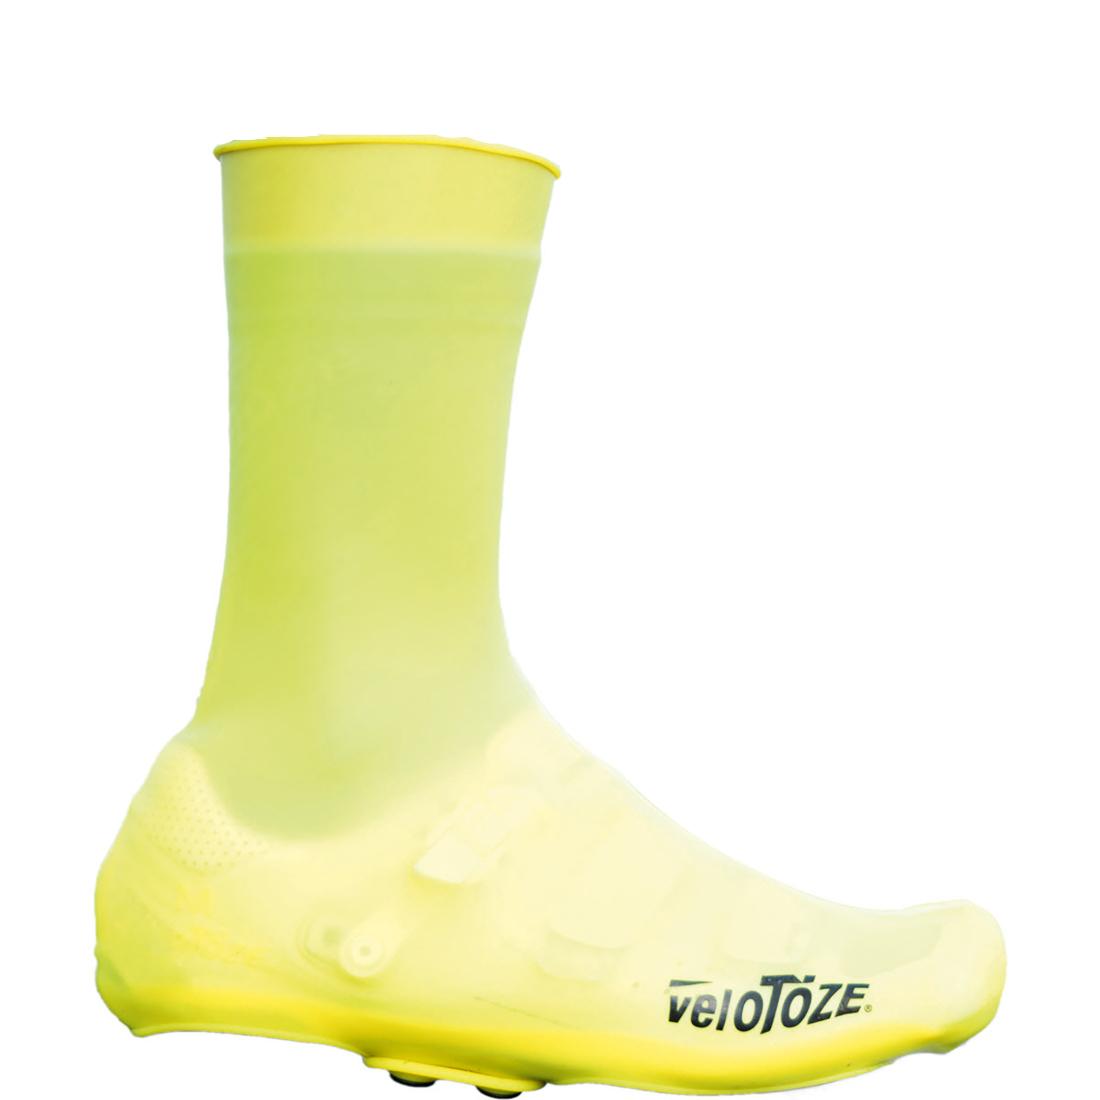 veloToze Silicone Snap Road Überschuh - Lang - viz-yellow